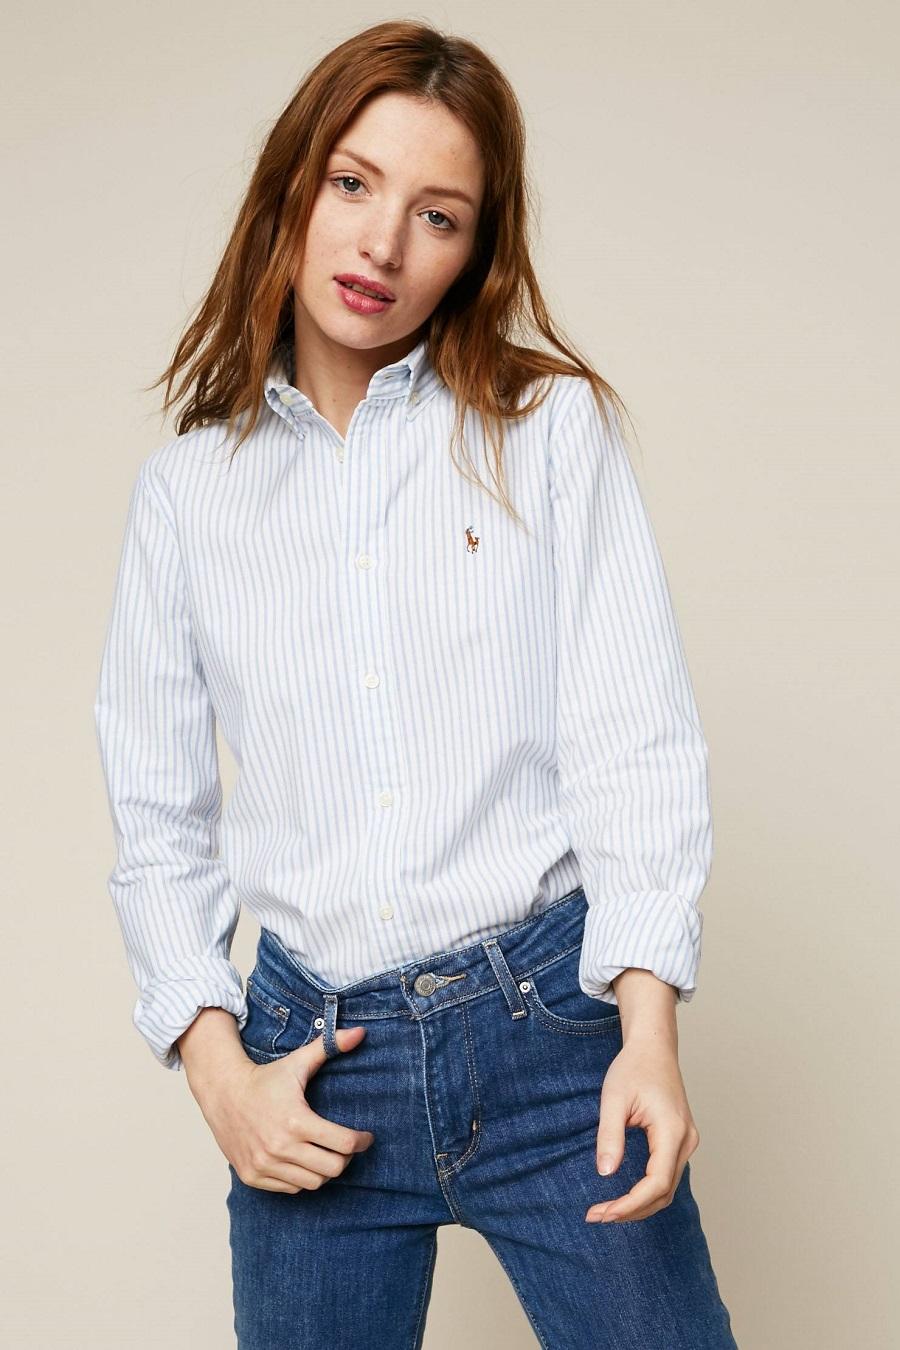 6d071b237b8 Polo Ralph Lauren Chemise à rayures blanc et bleu - Chemise Femme ...